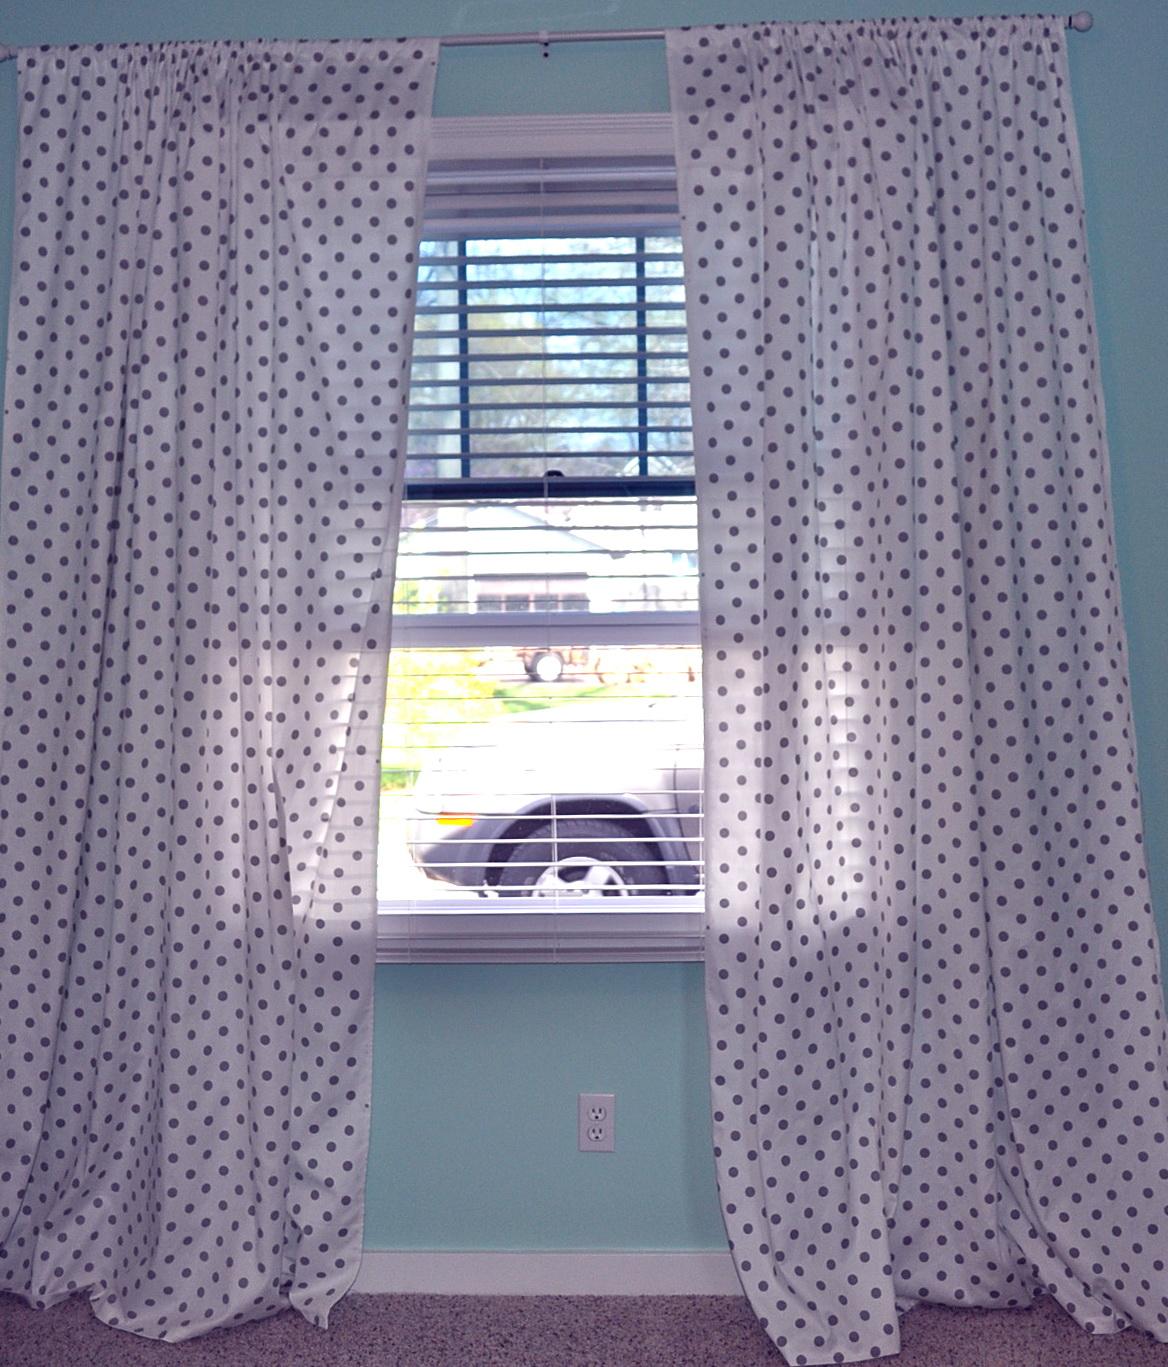 White And Gray Polka Dot Curtains